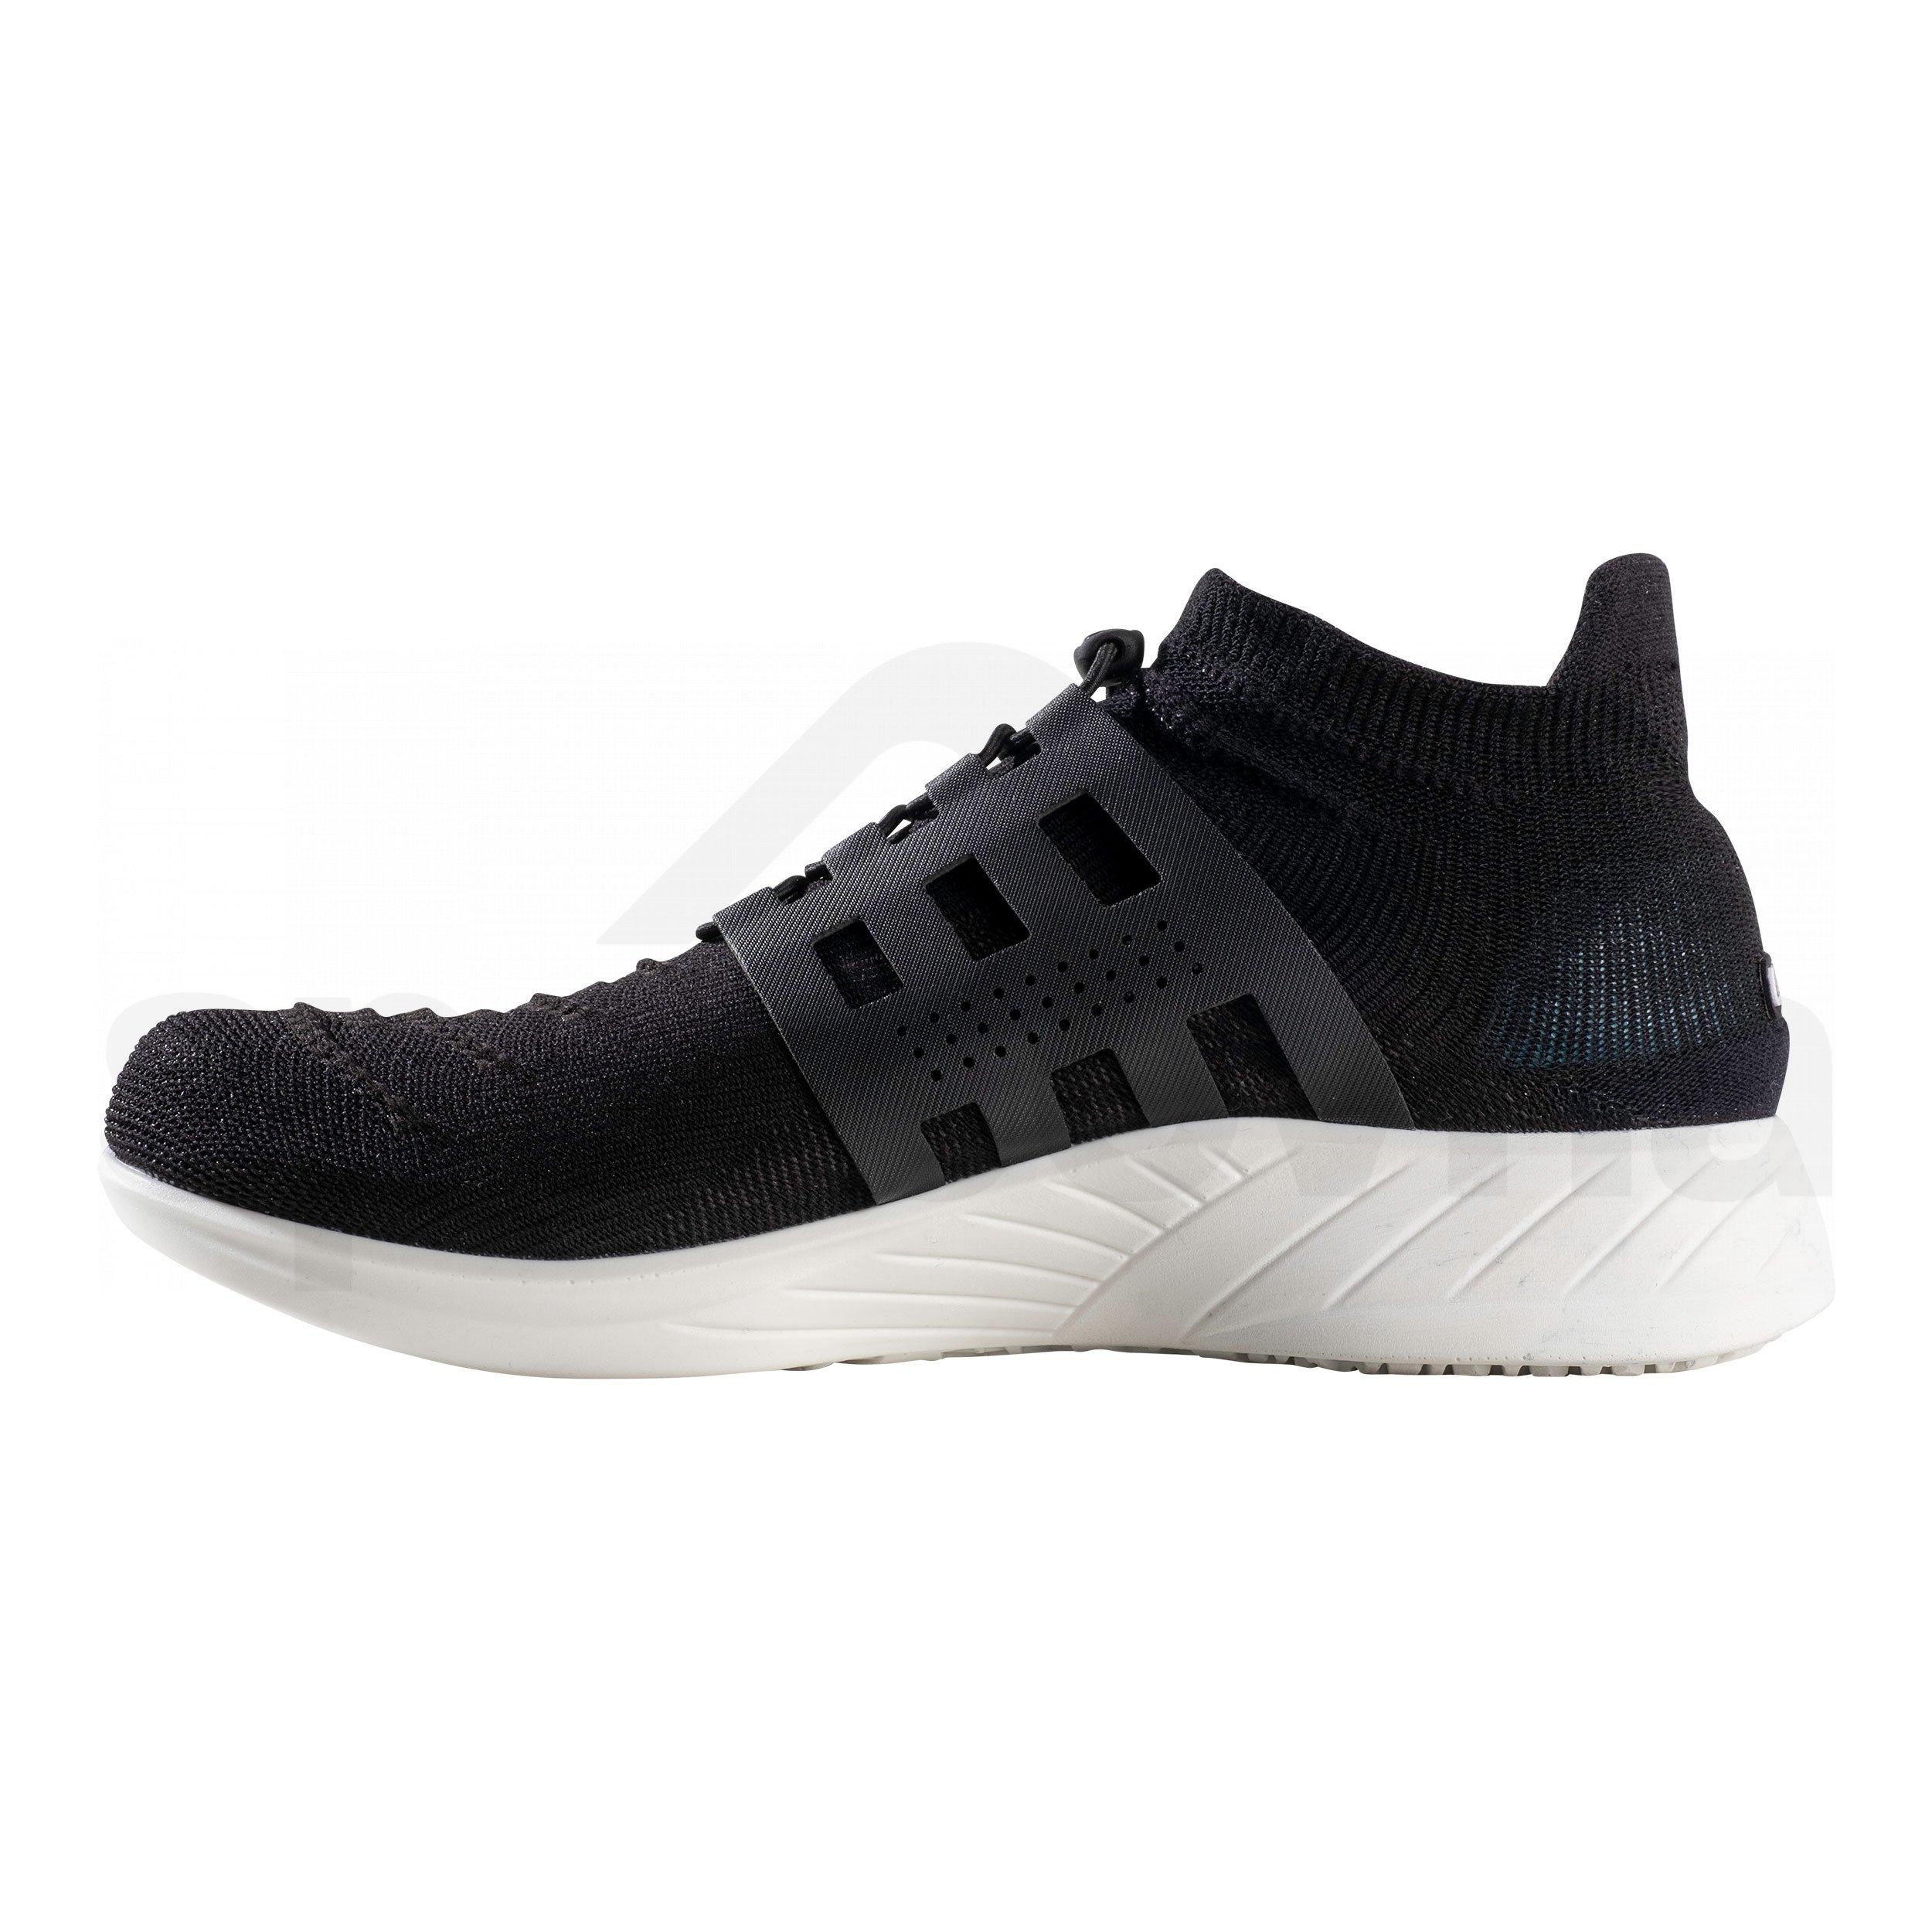 Obuv UYN x-cross tune shoes - černá/bílá